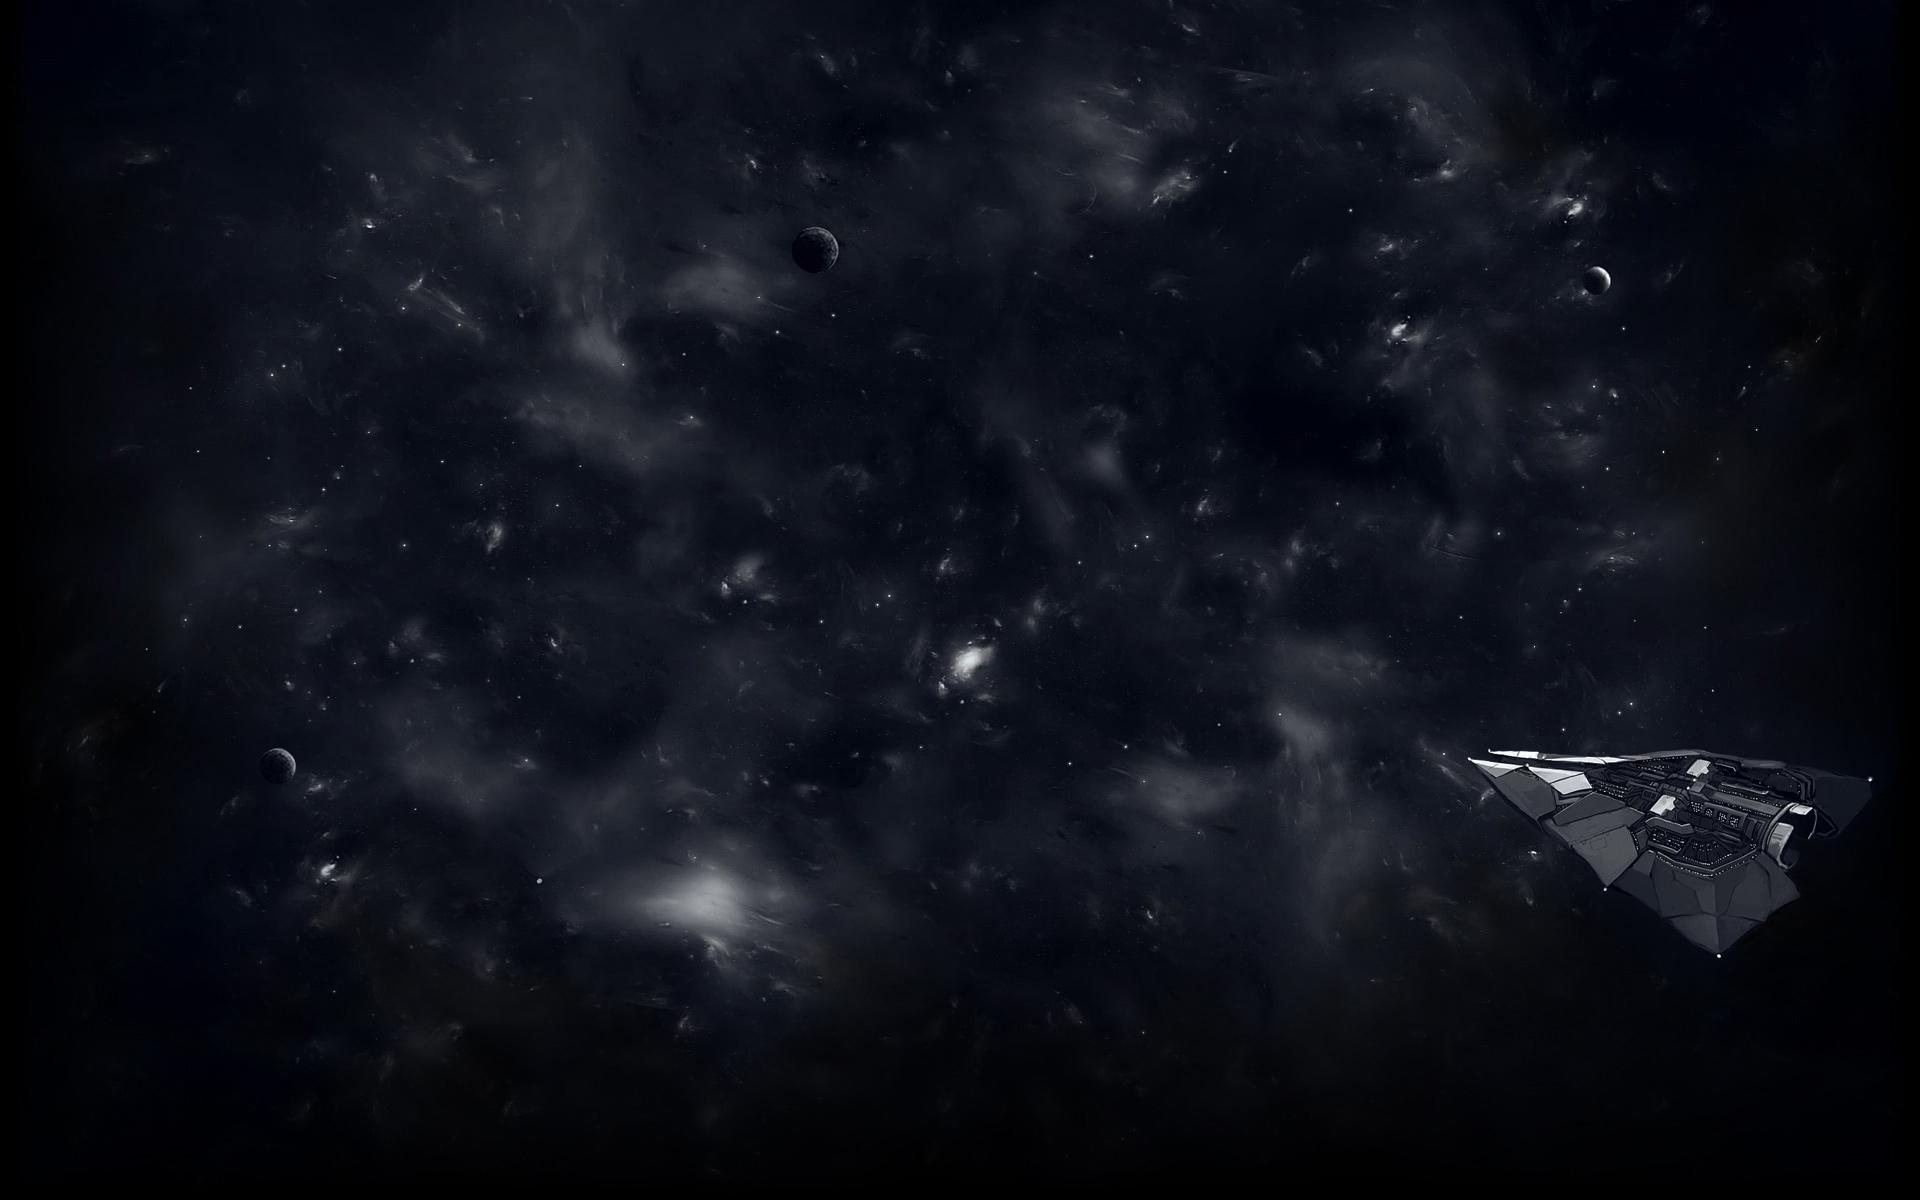 stellatum game wallpaper 73967